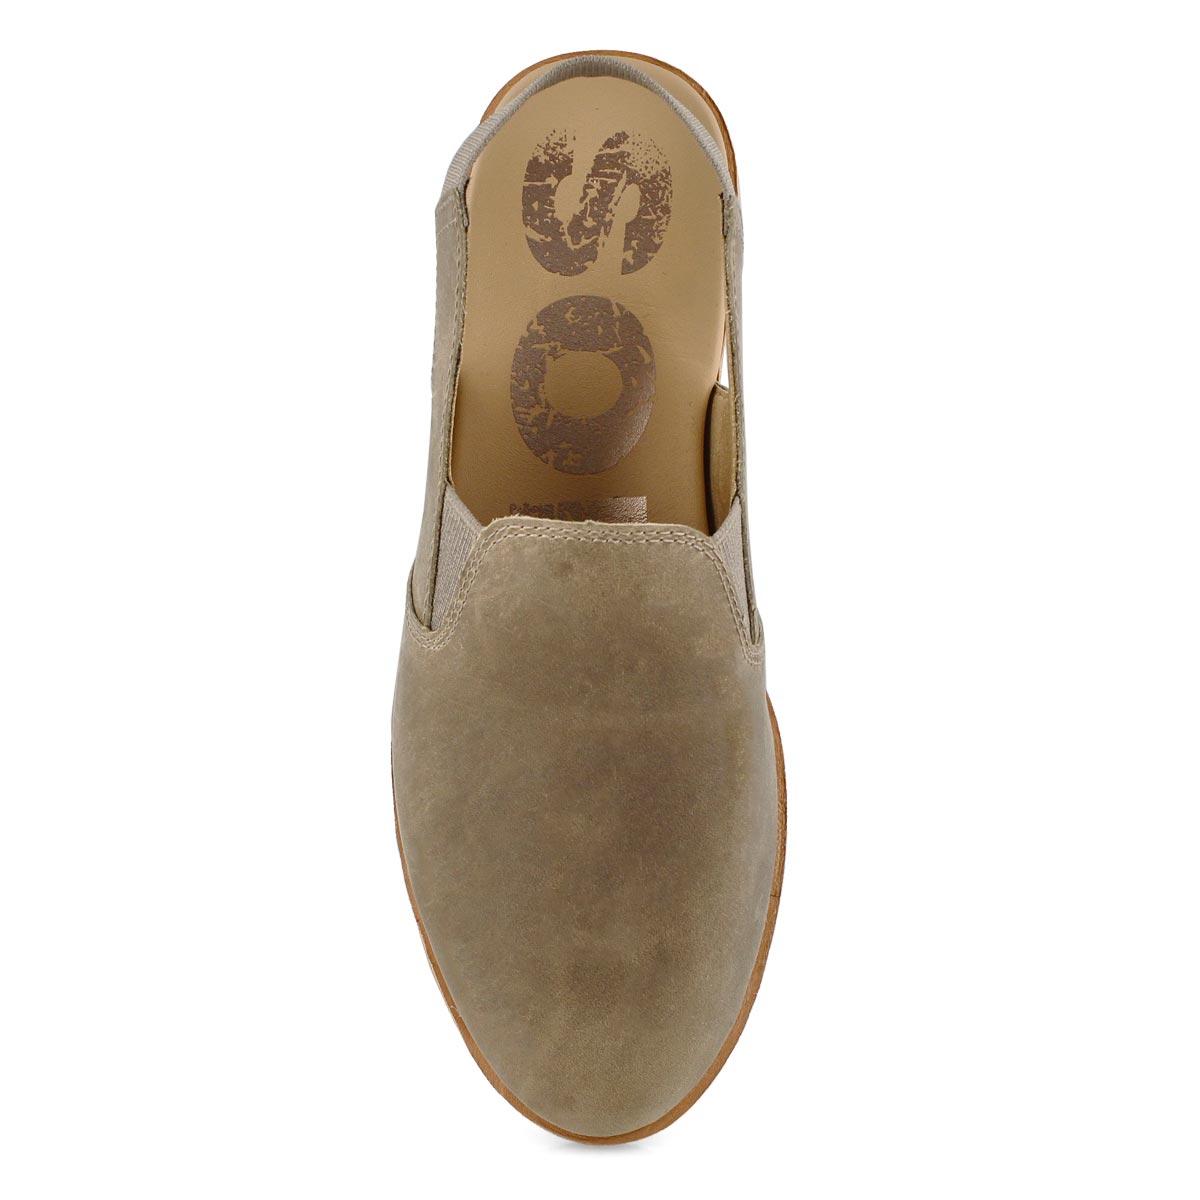 Chaussures ELLA SLINGBACK, brun cendré, femmes